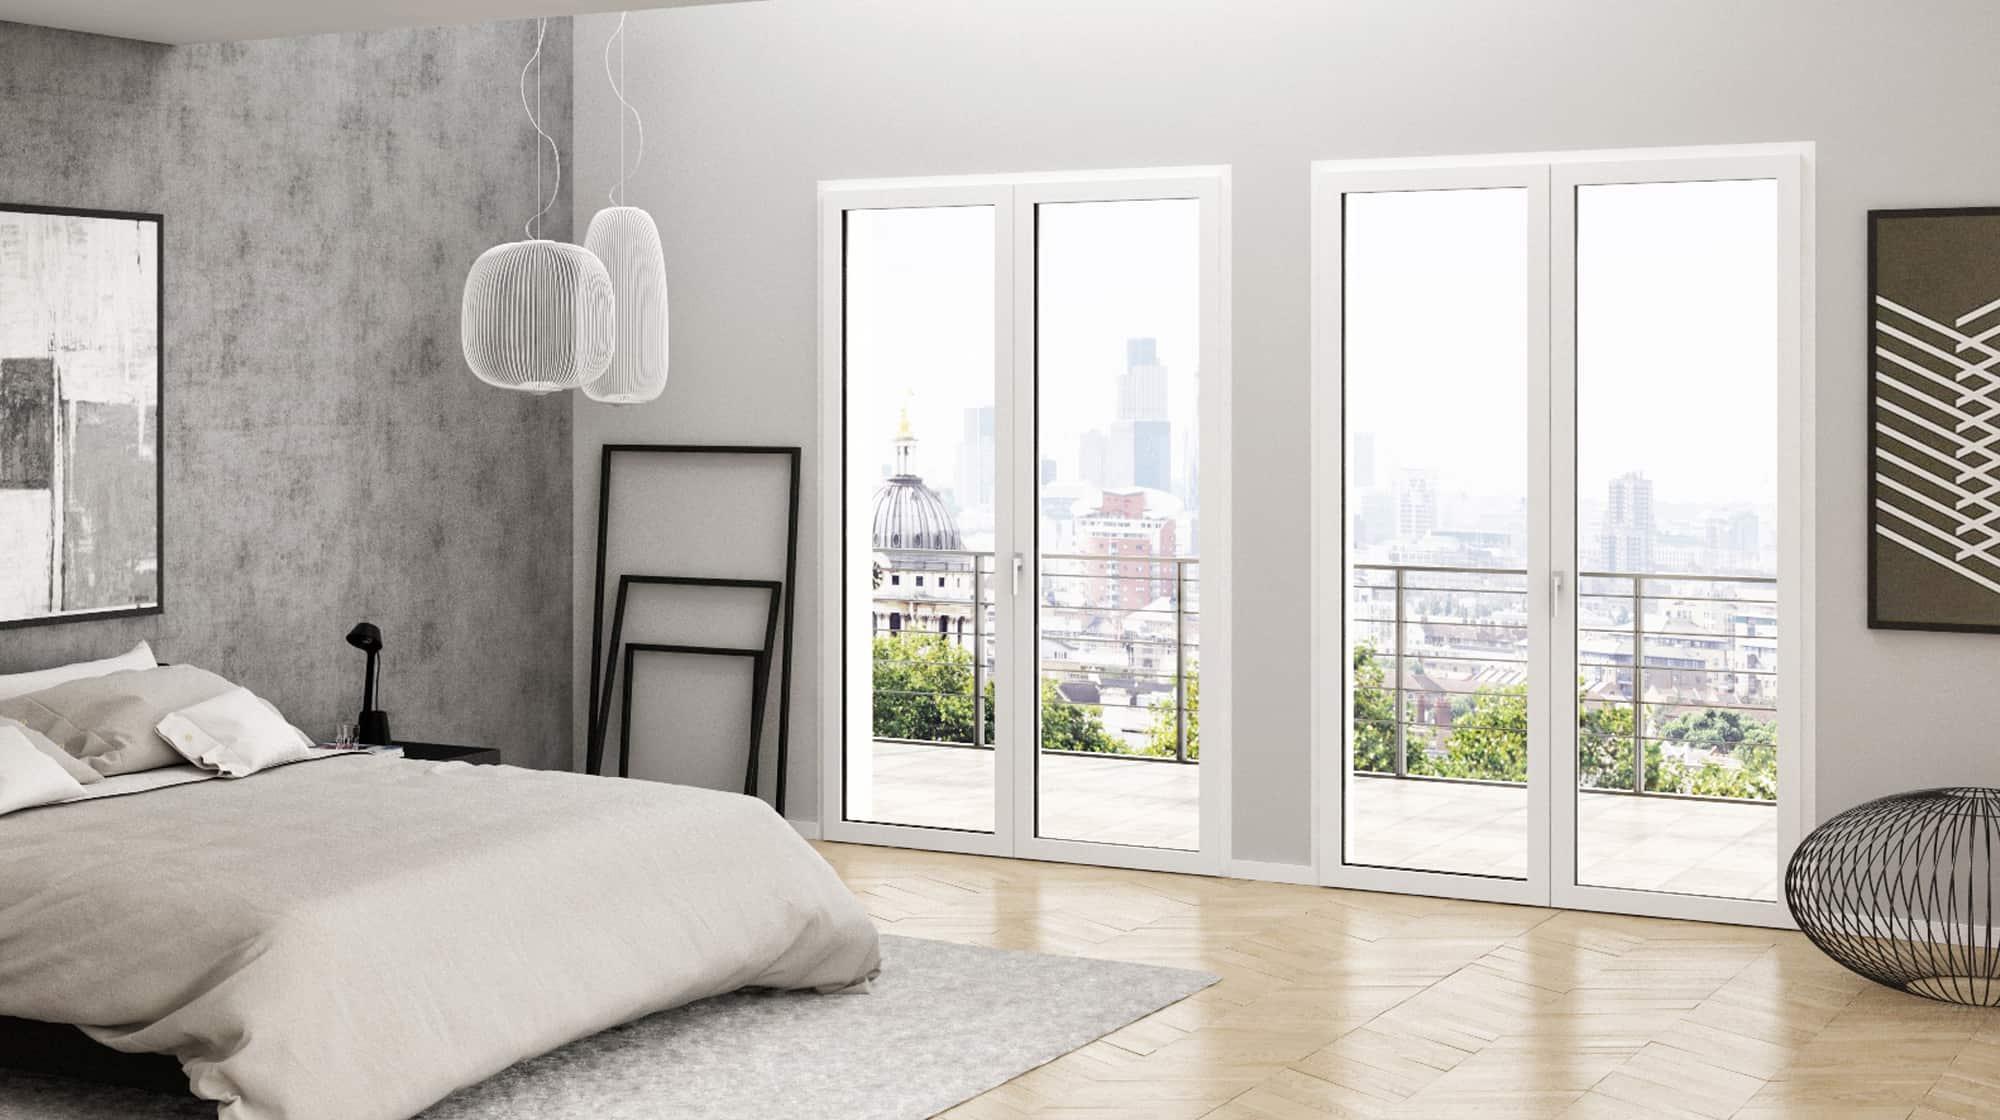 Finestre oknoplast roma bartocci porte e finestre roma - Le finestre roma ...